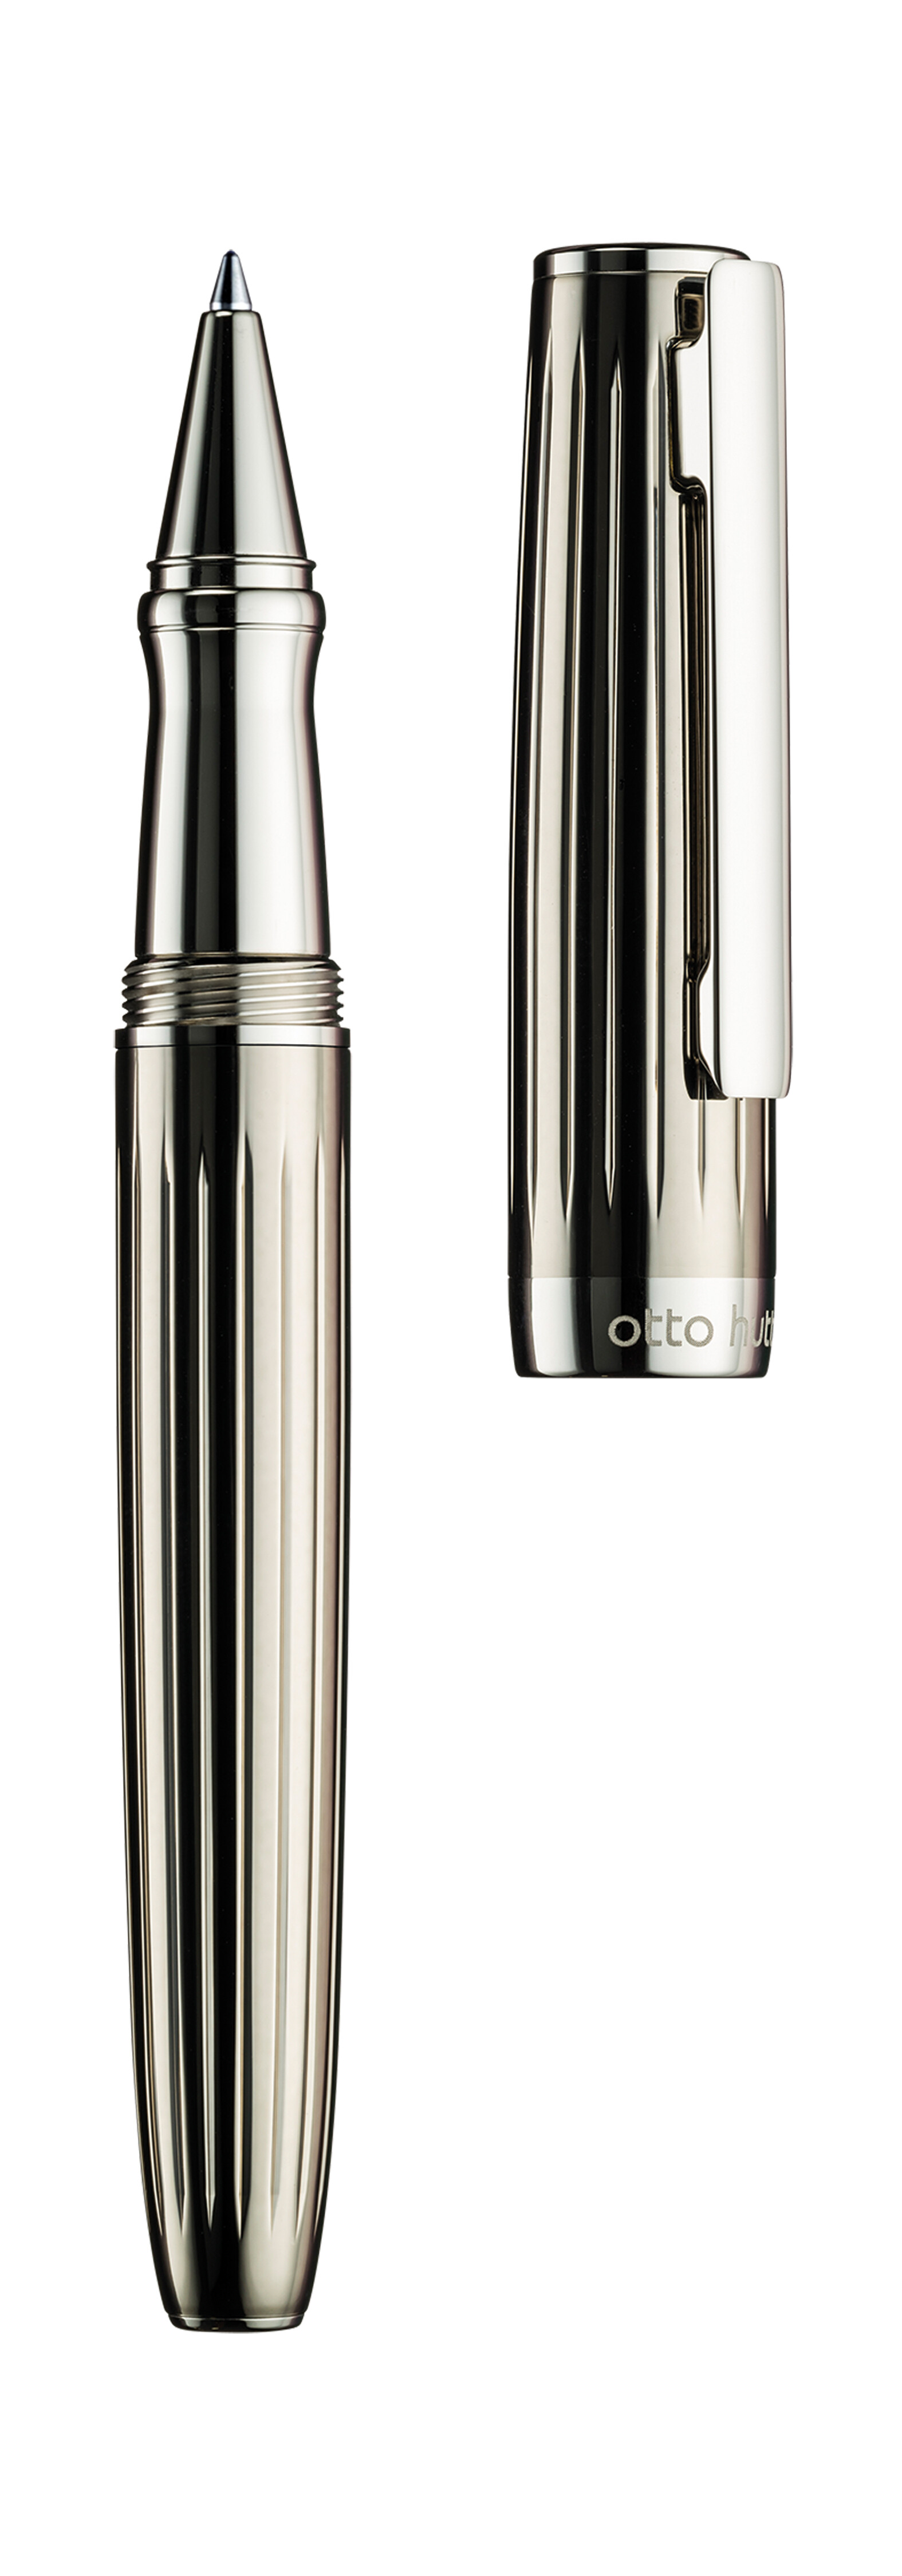 D07 Tintenroller, schwarz transparent lackiert streifen, Teile platiniert 01